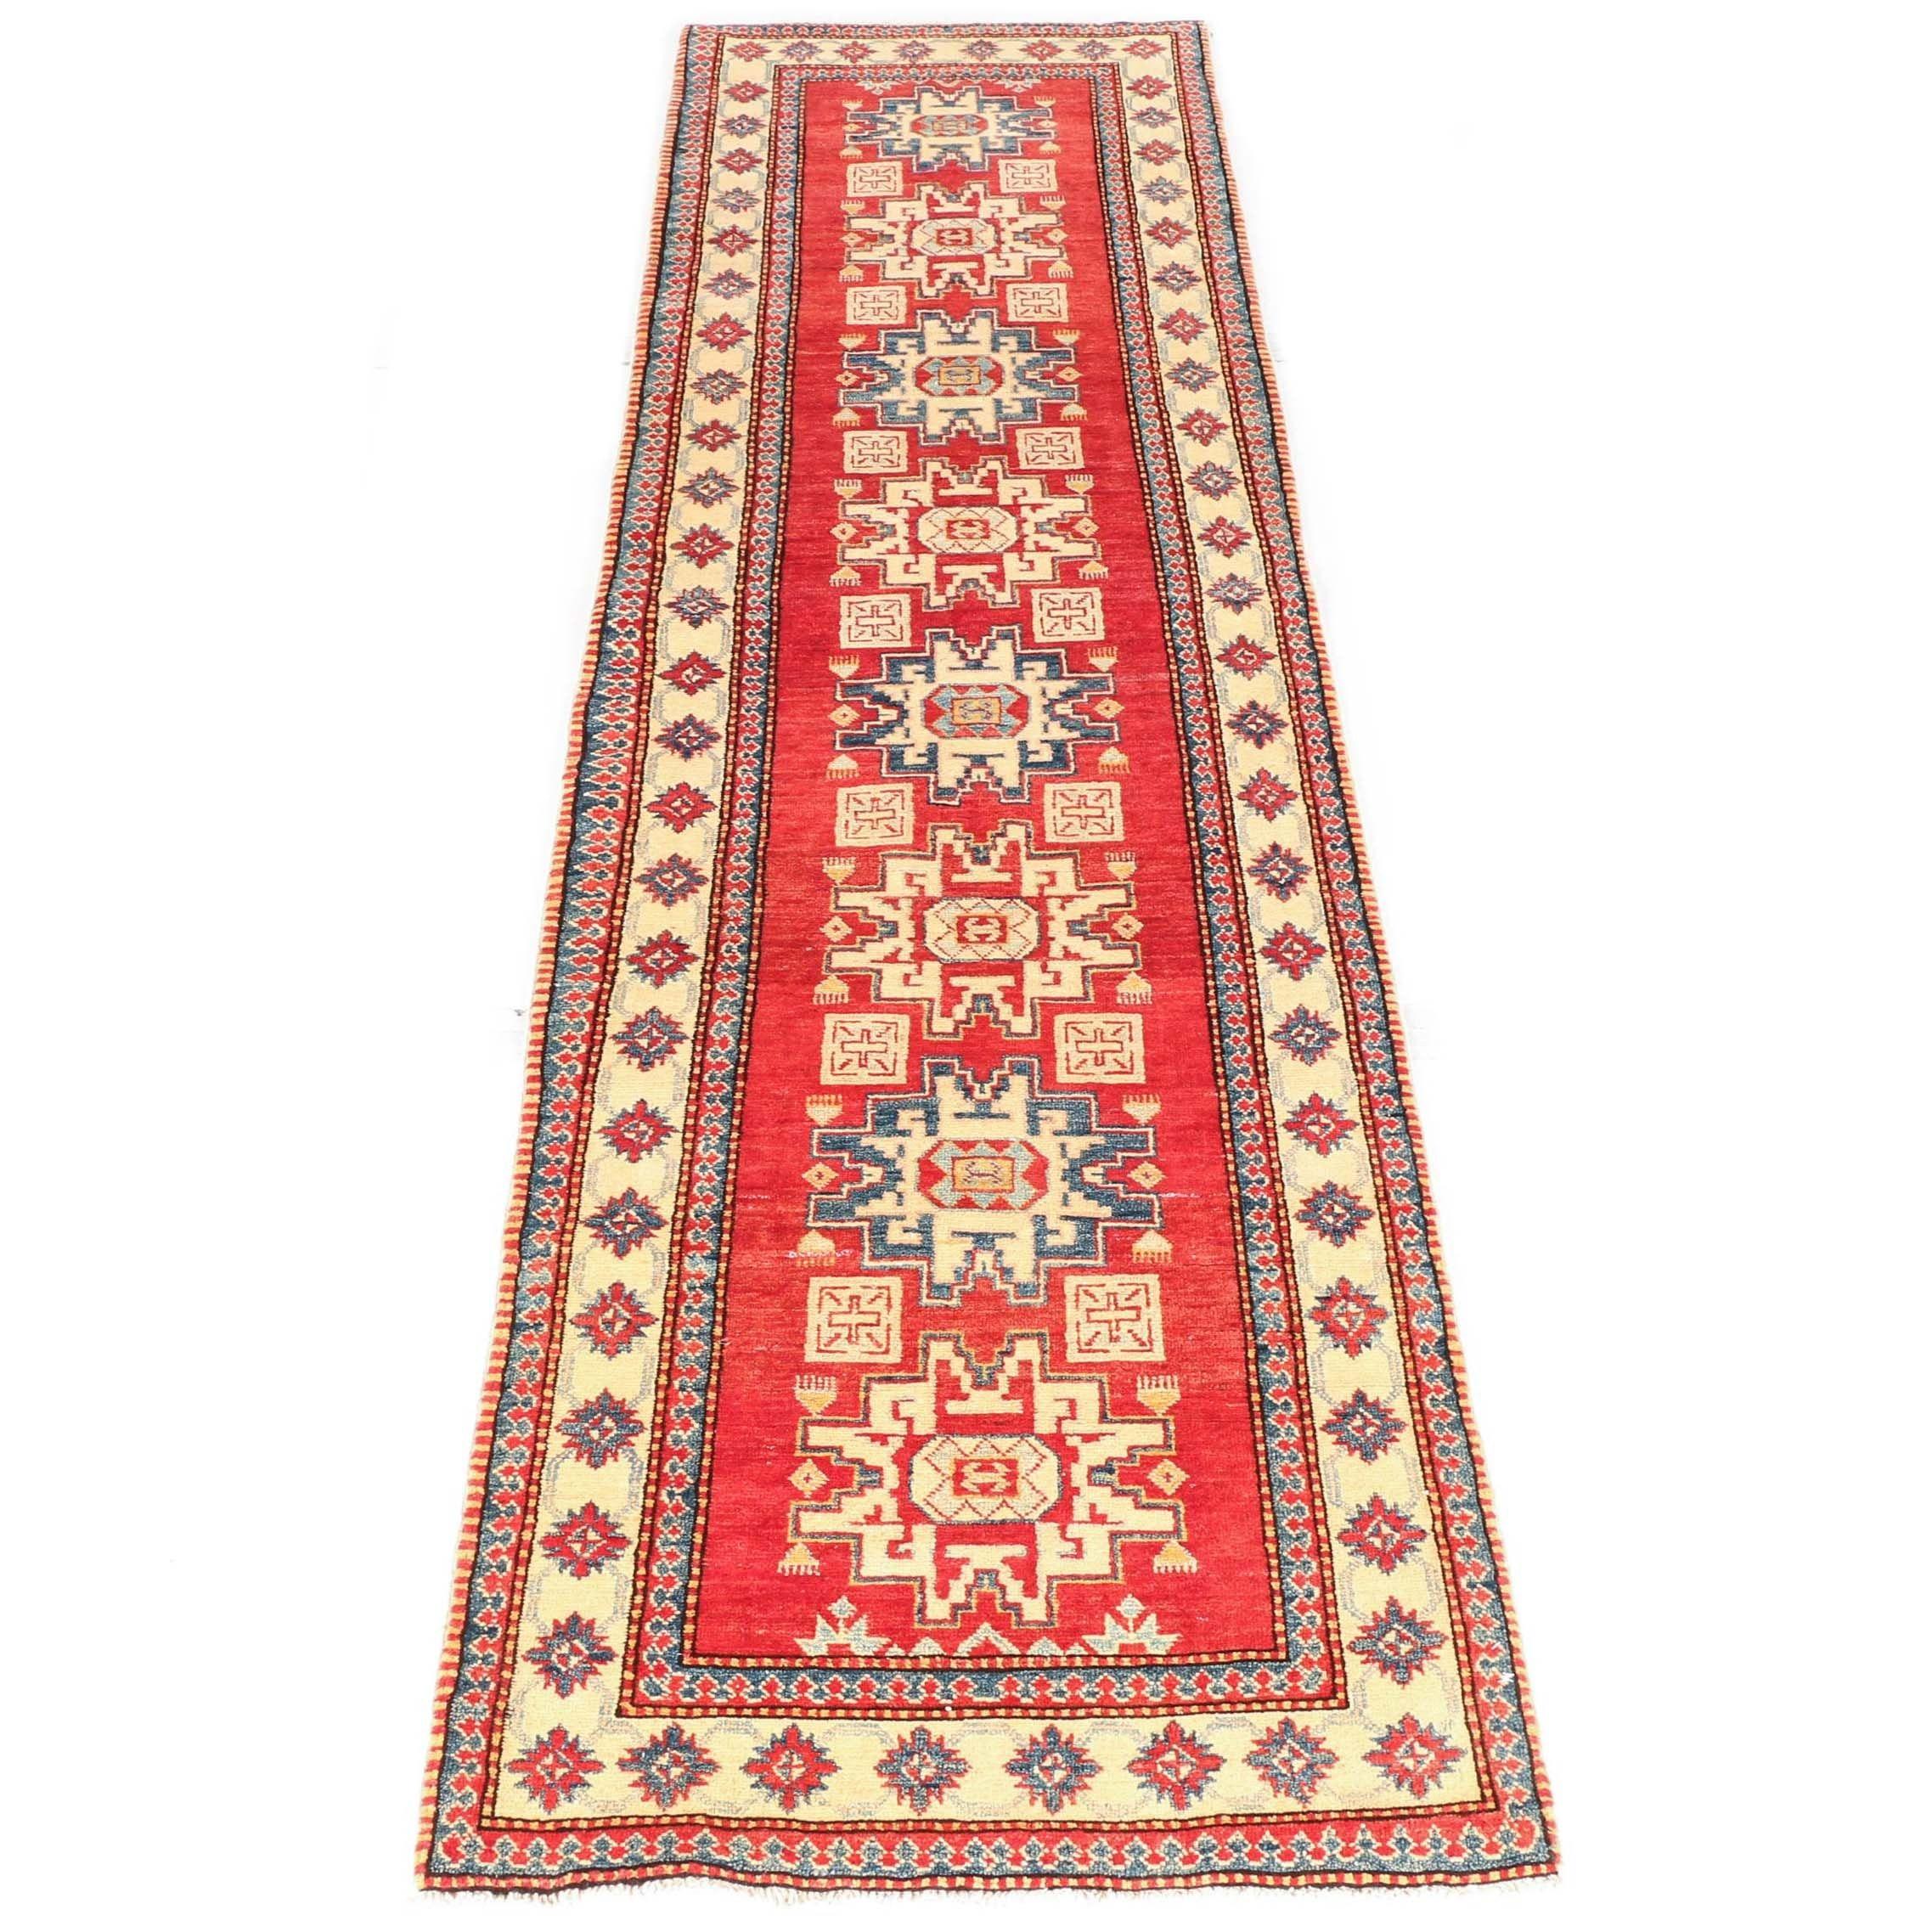 Hand-Knotted Caucasian Lesghi Carpet Runner